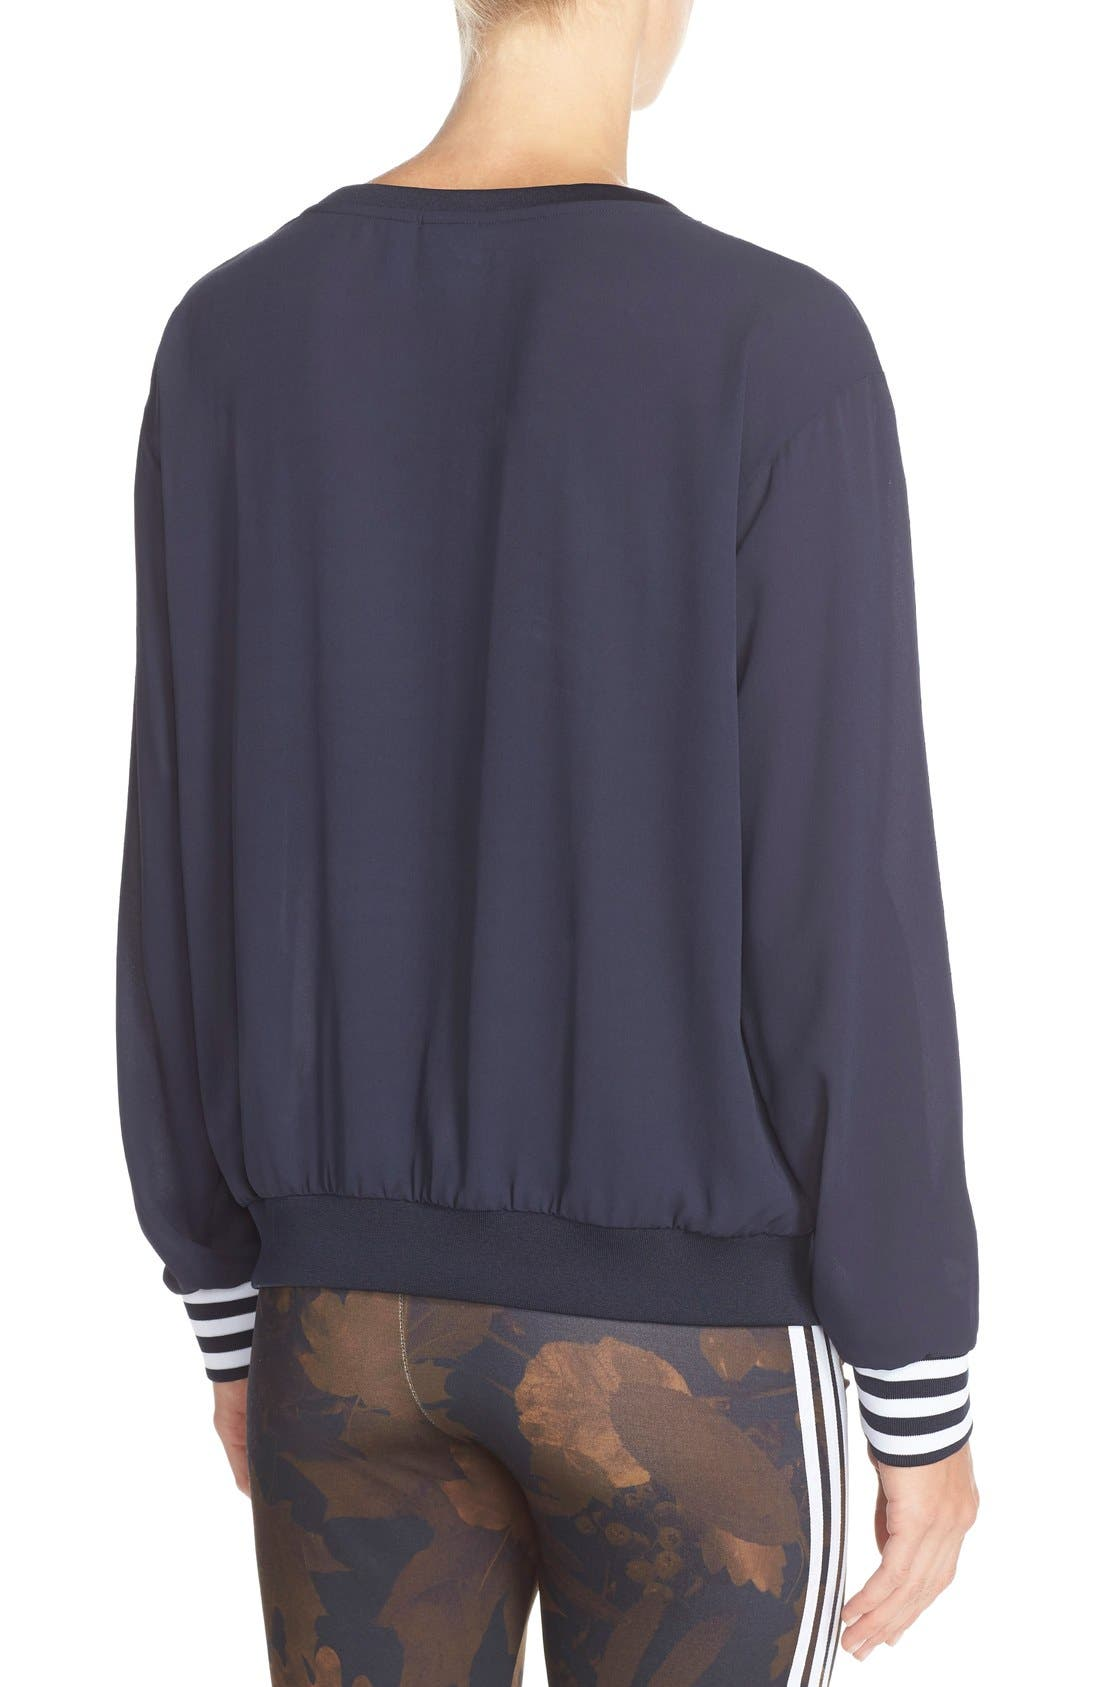 Alternate Image 2  - adidas Originals Trefoil Crewneck Sweatshirt